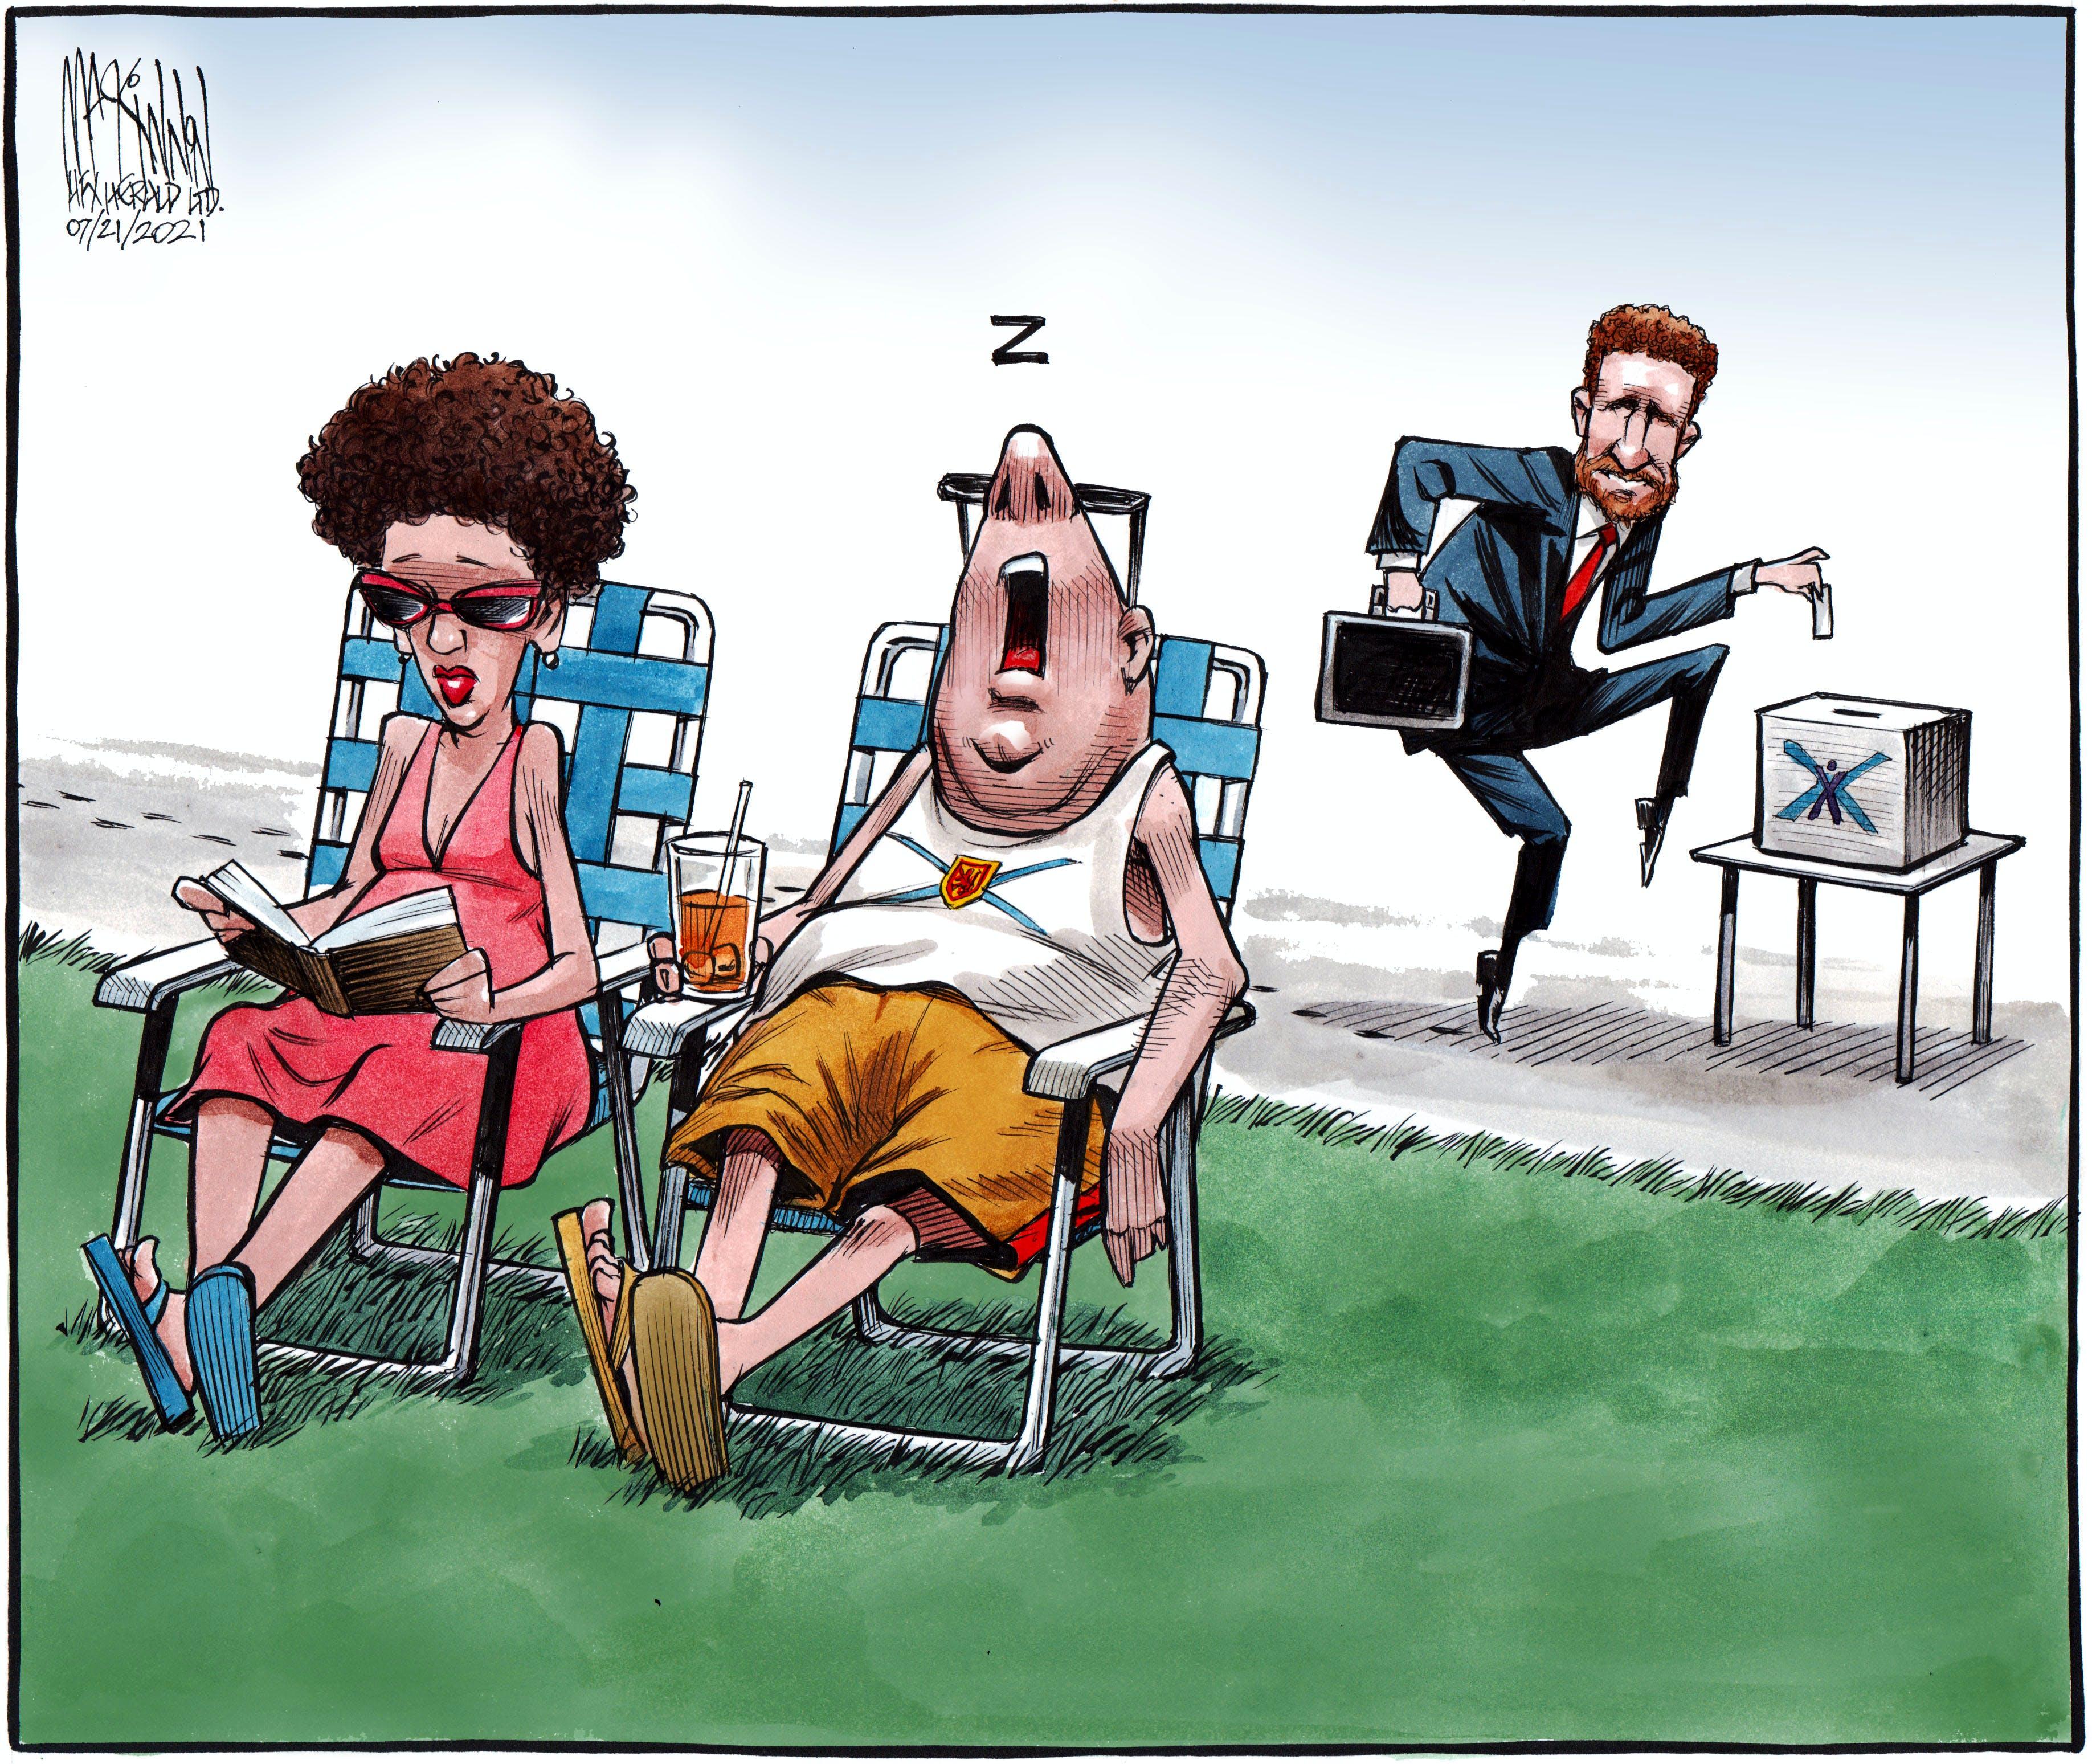 Bruce MacKinnon's cartoon for July 21, 2021.